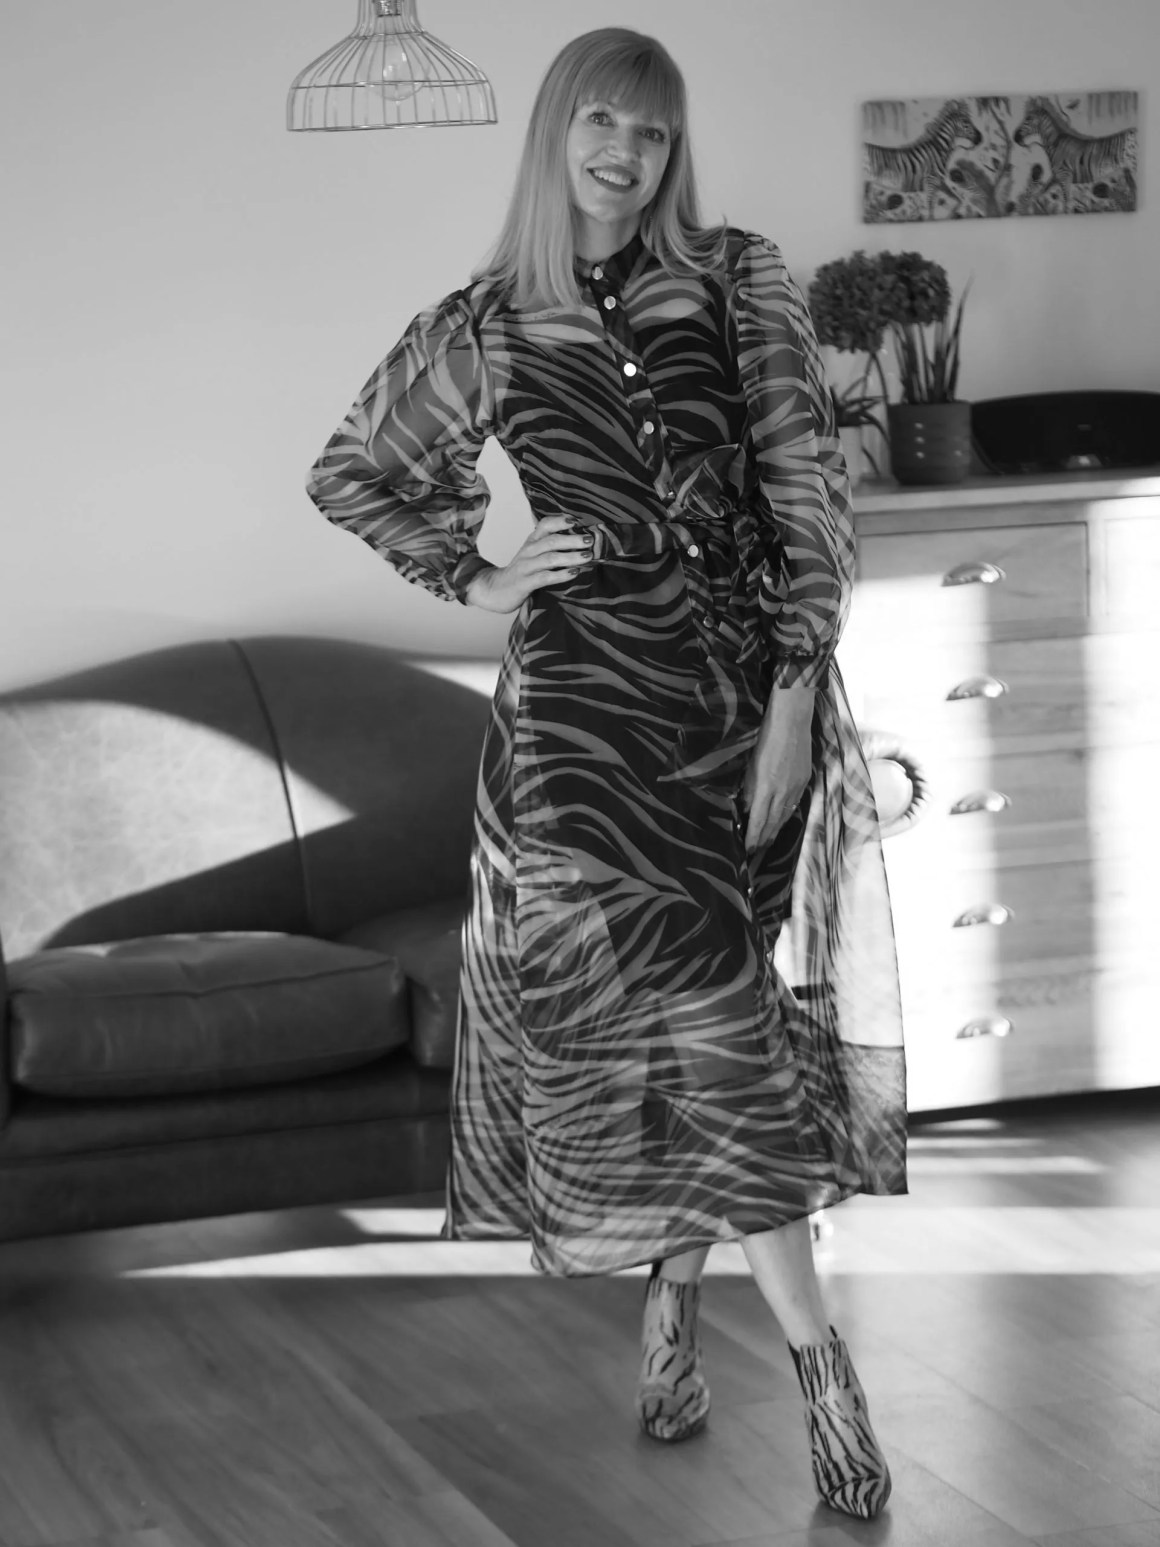 zebra print and tiger print